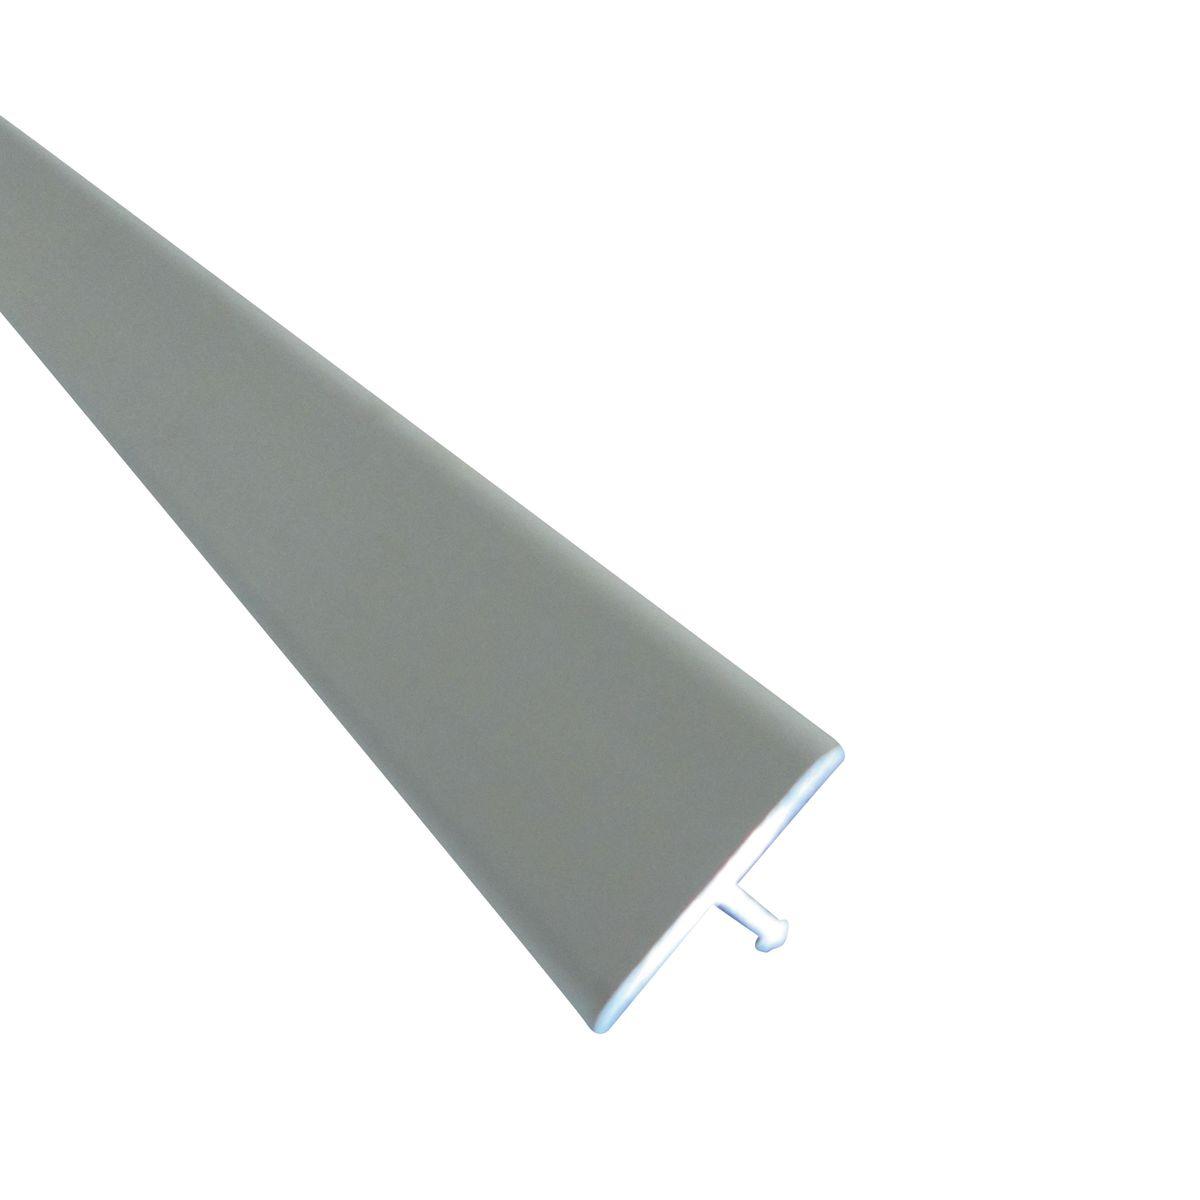 Parquet flottante prezzi leroy merlin pavimenti giardino for Prezzi scale alluminio leroy merlin